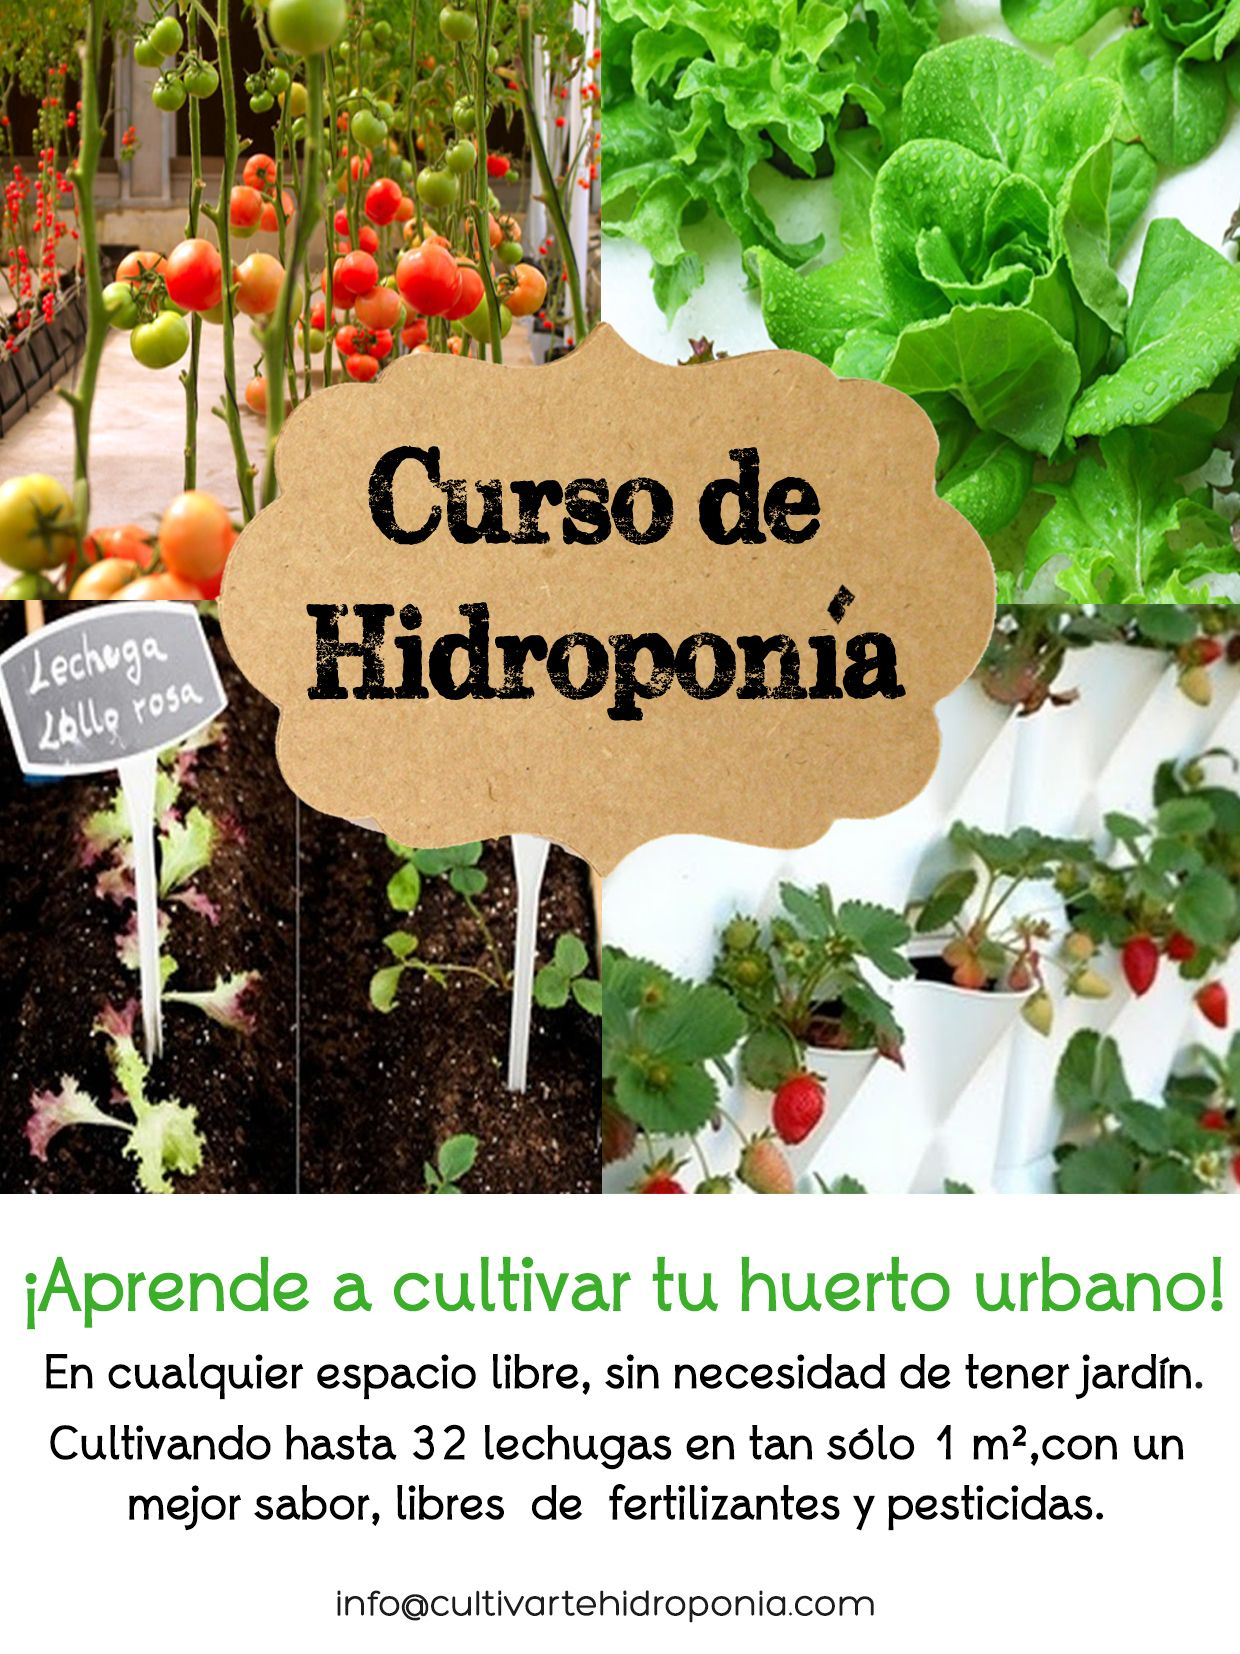 Curso Hidropona BsicoDescubre como cultivar hasta 32 lechugas en